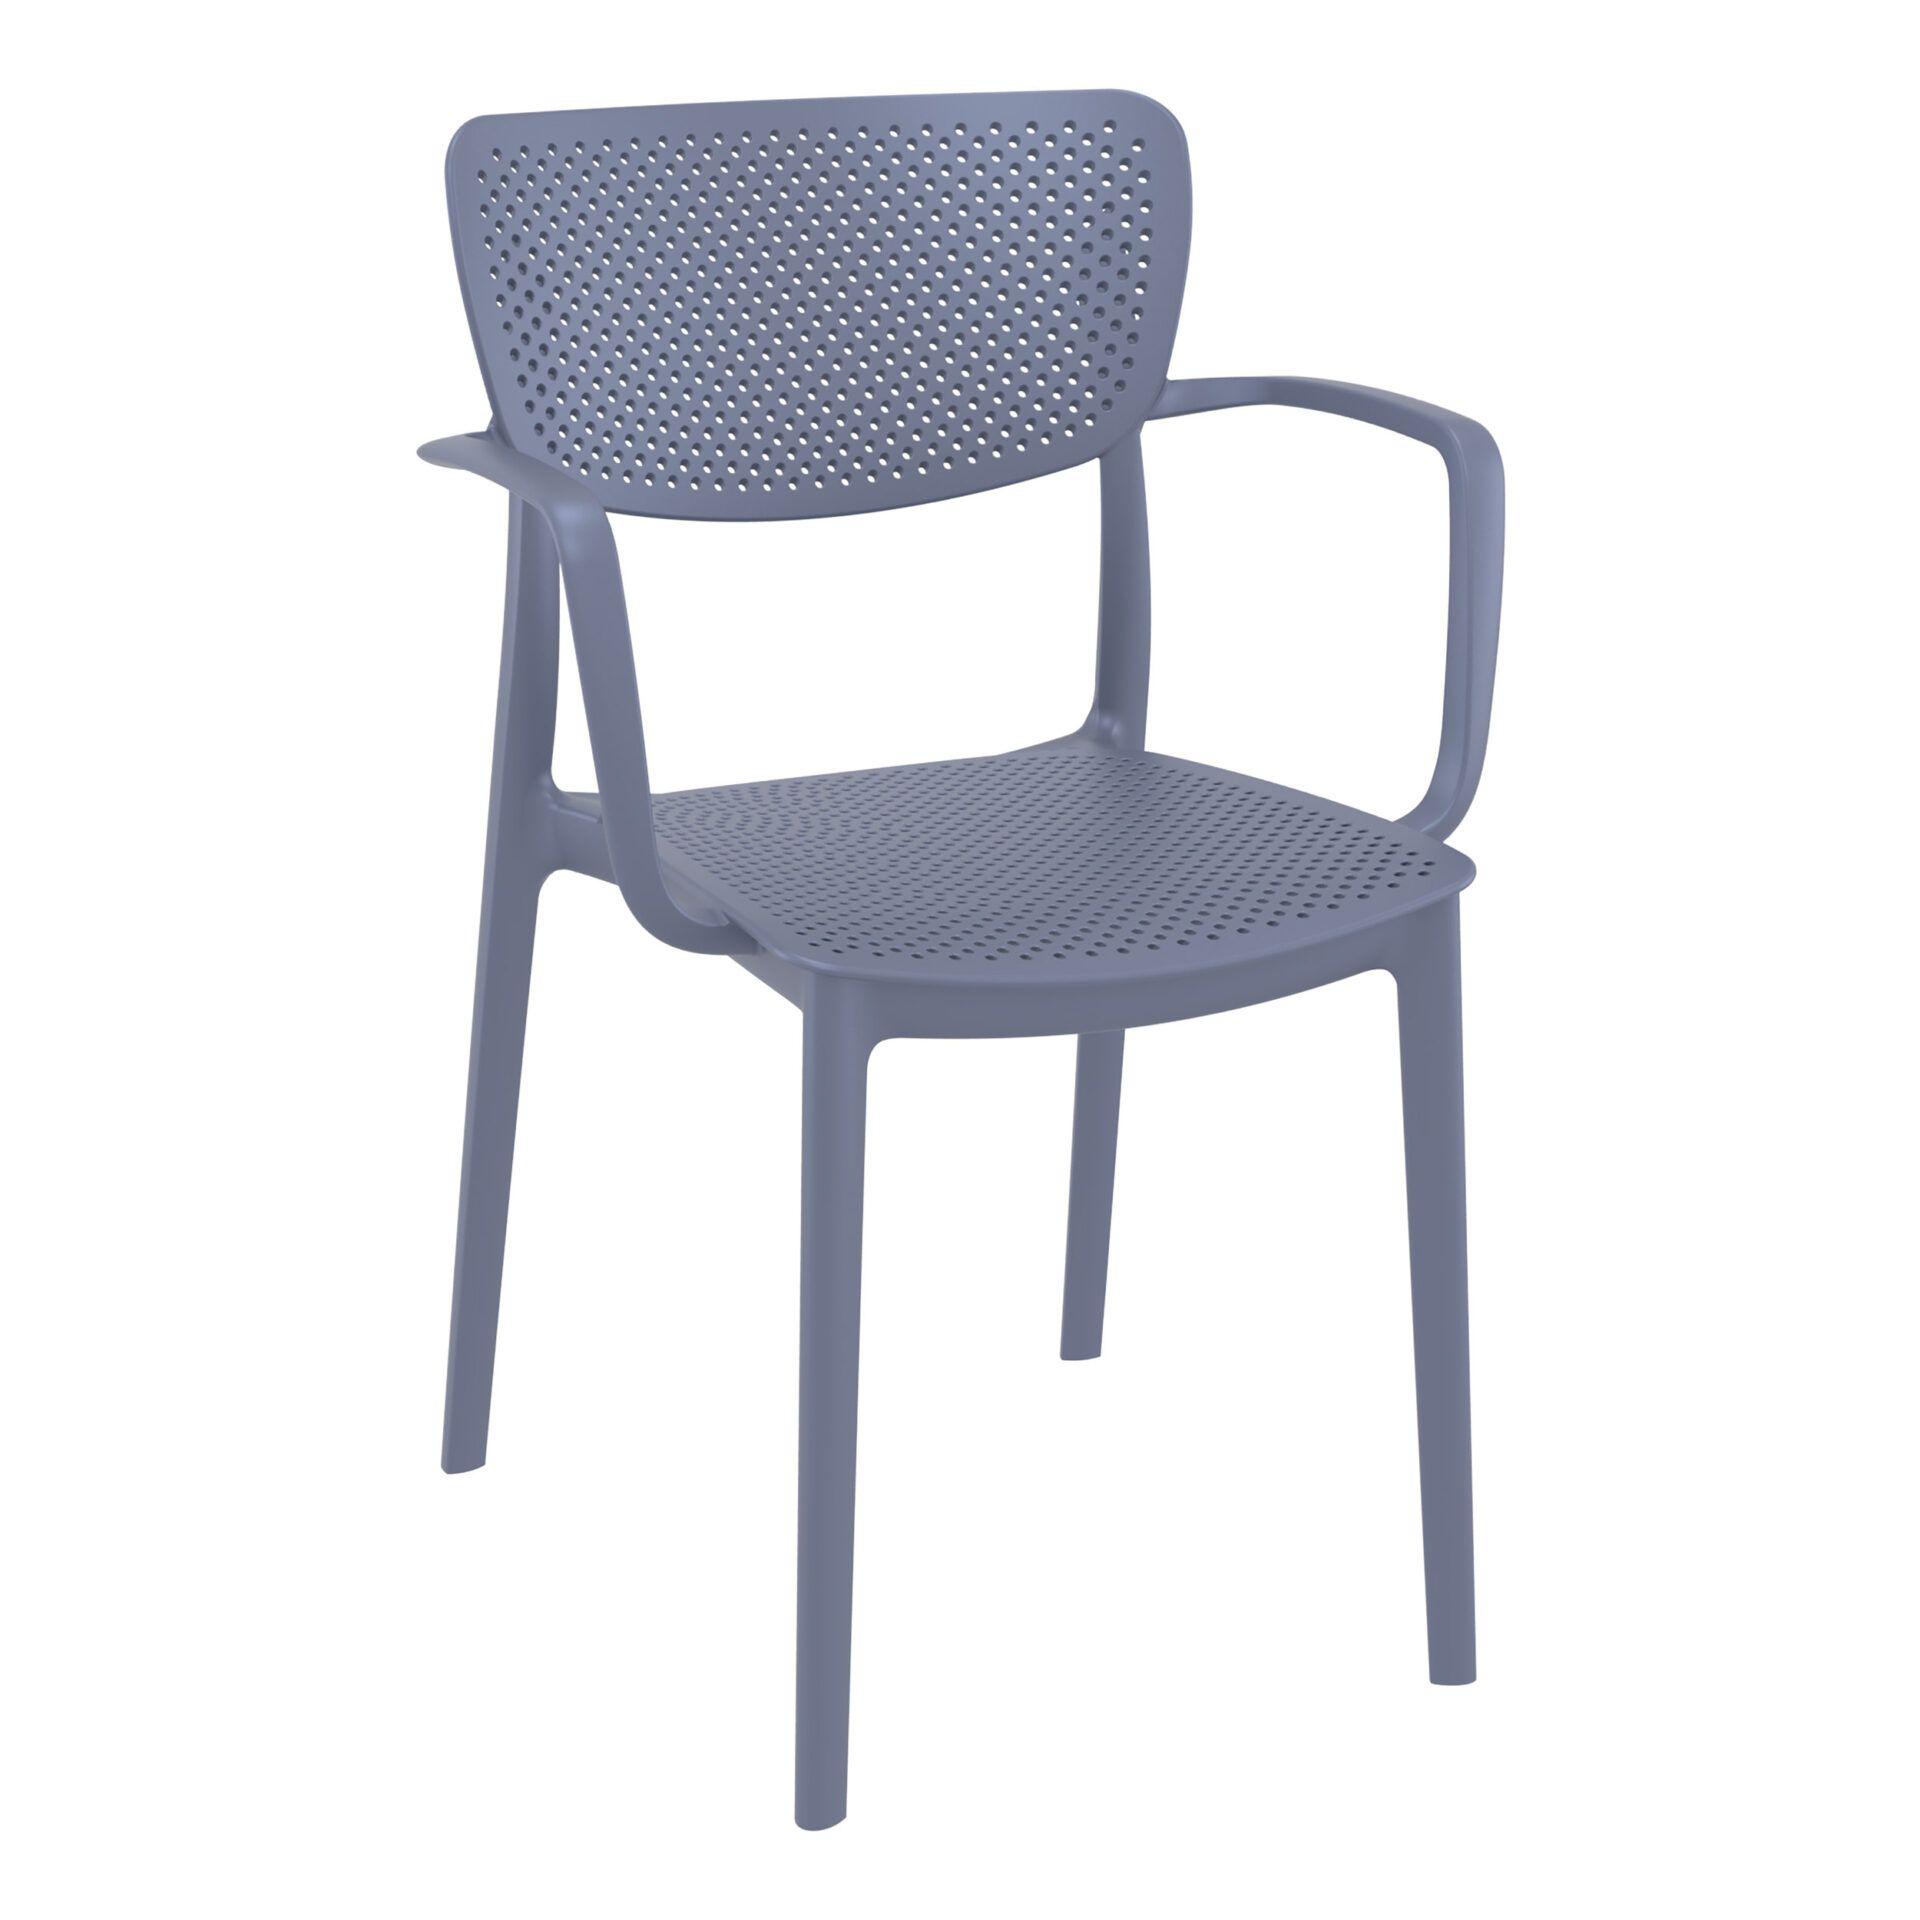 polypropylene hospitality seating loft armchair darkgrey front side